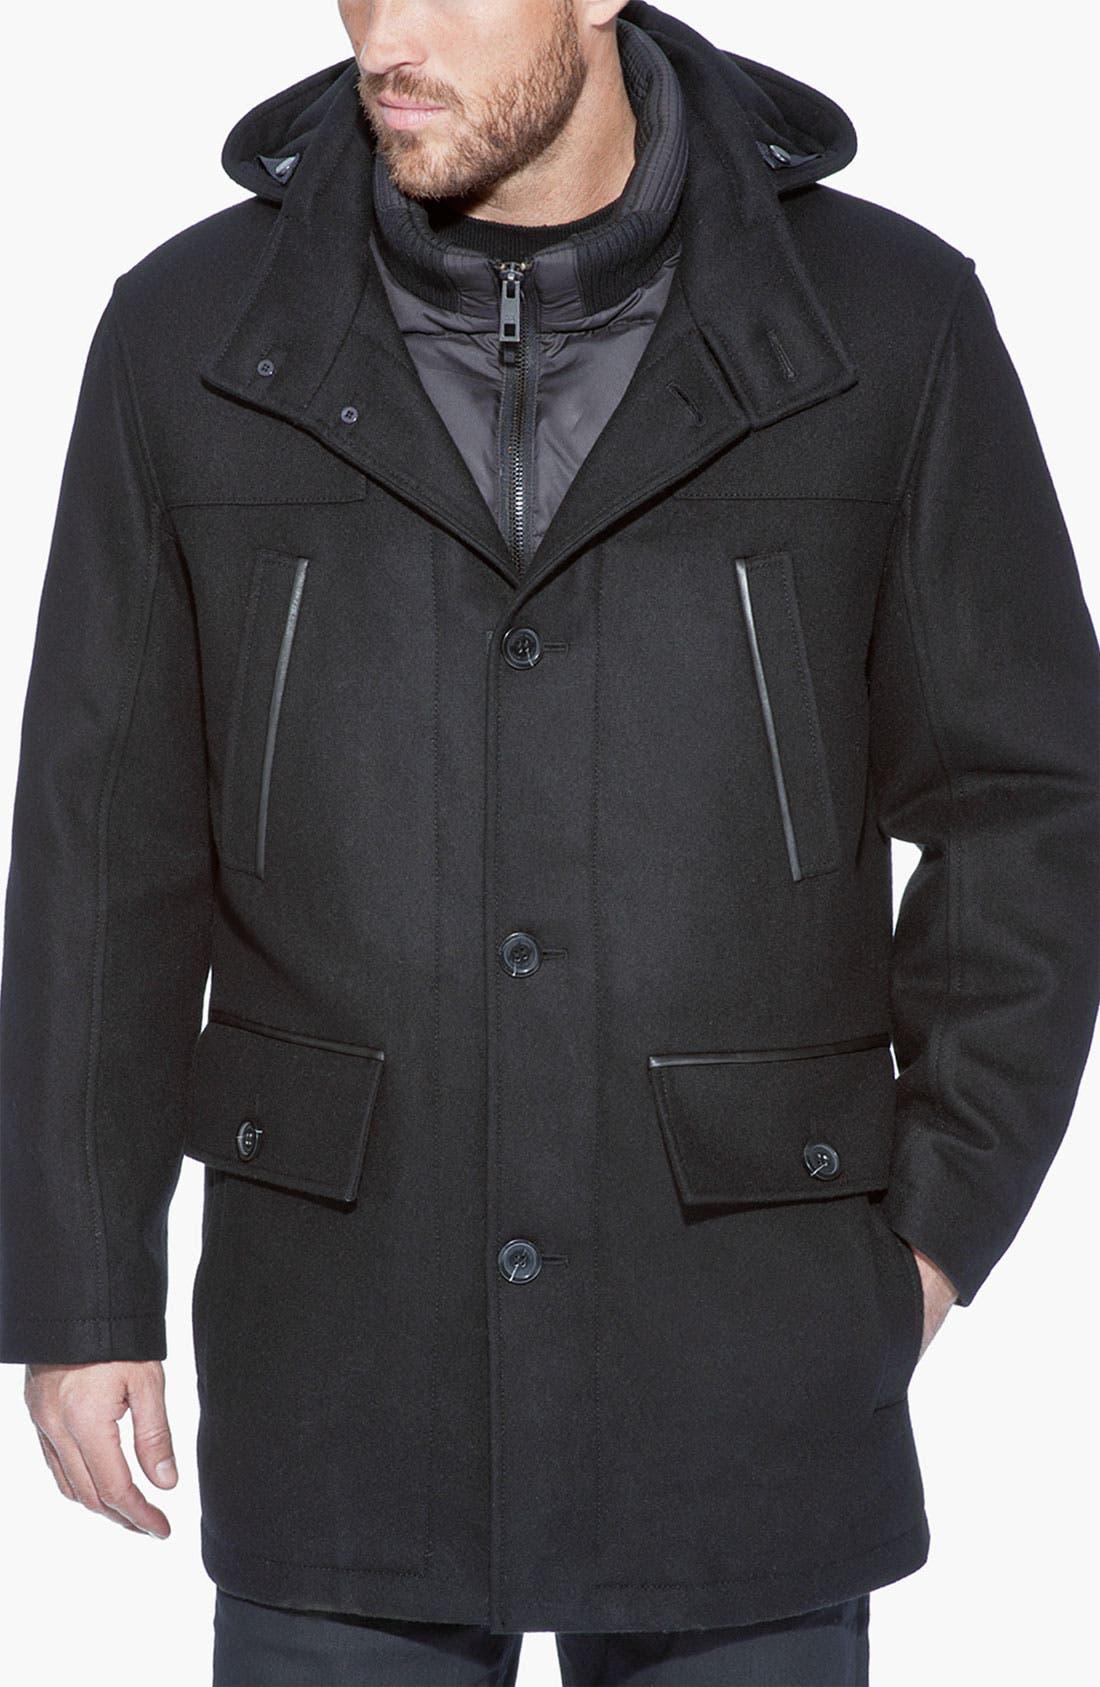 Alternate Image 1 Selected - Andrew Marc 'Weber' Water Resistant Wool Blend Jacket